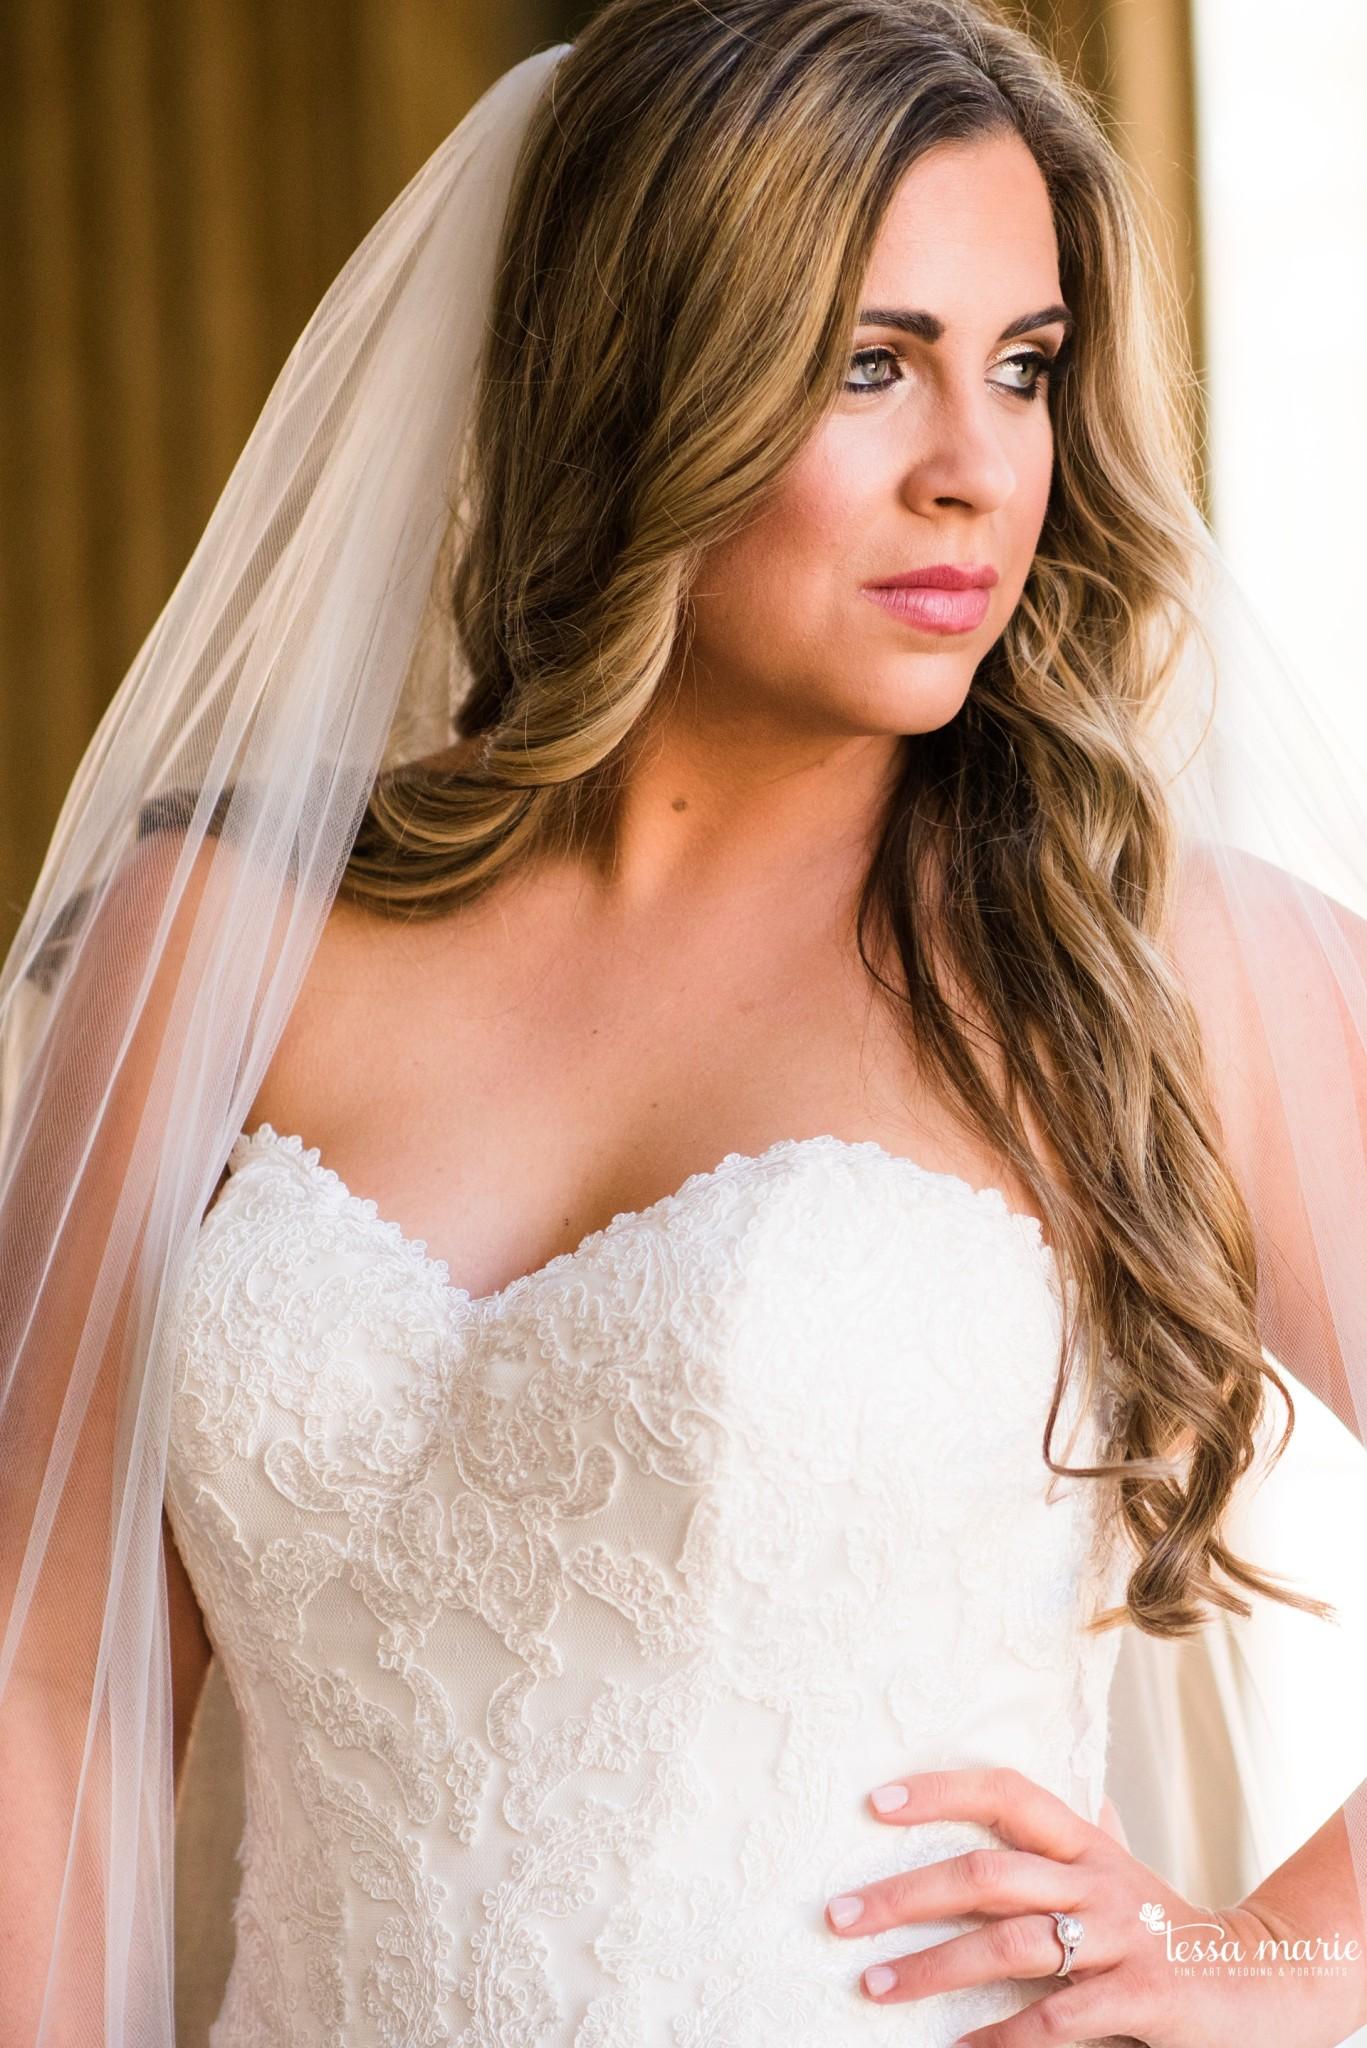 tessa_marie_legacy_moments_storytelling_candid_emotionally_driven_wedding_photographer_atlanta_wedding_photography_st_ives_country_club_wedding_boukates_bridals_by_lori_0004